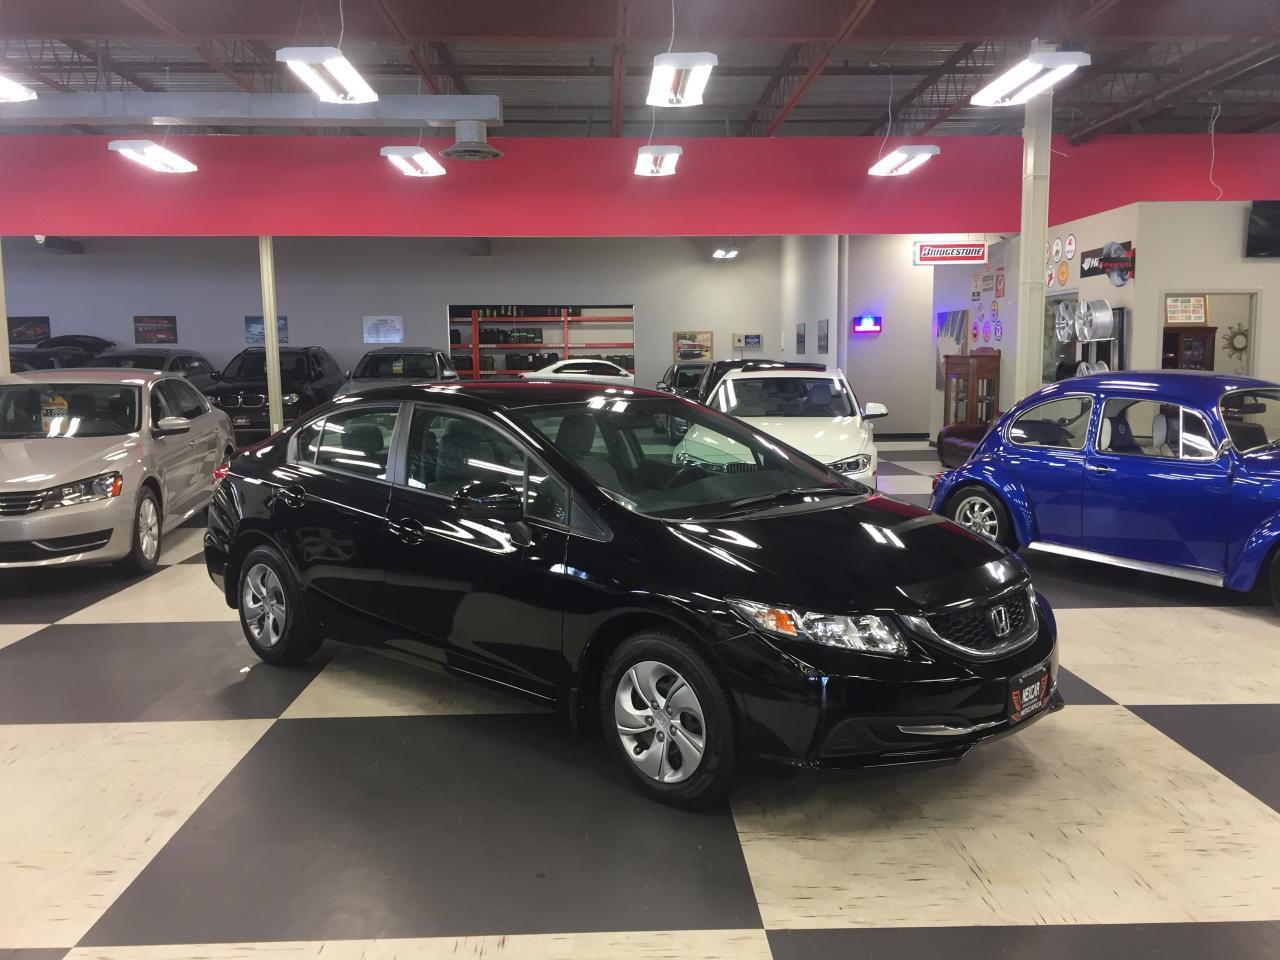 2015 Honda Civic LX AUT0 A/C CRUISE H/SEATS BLUETOOTH 59K